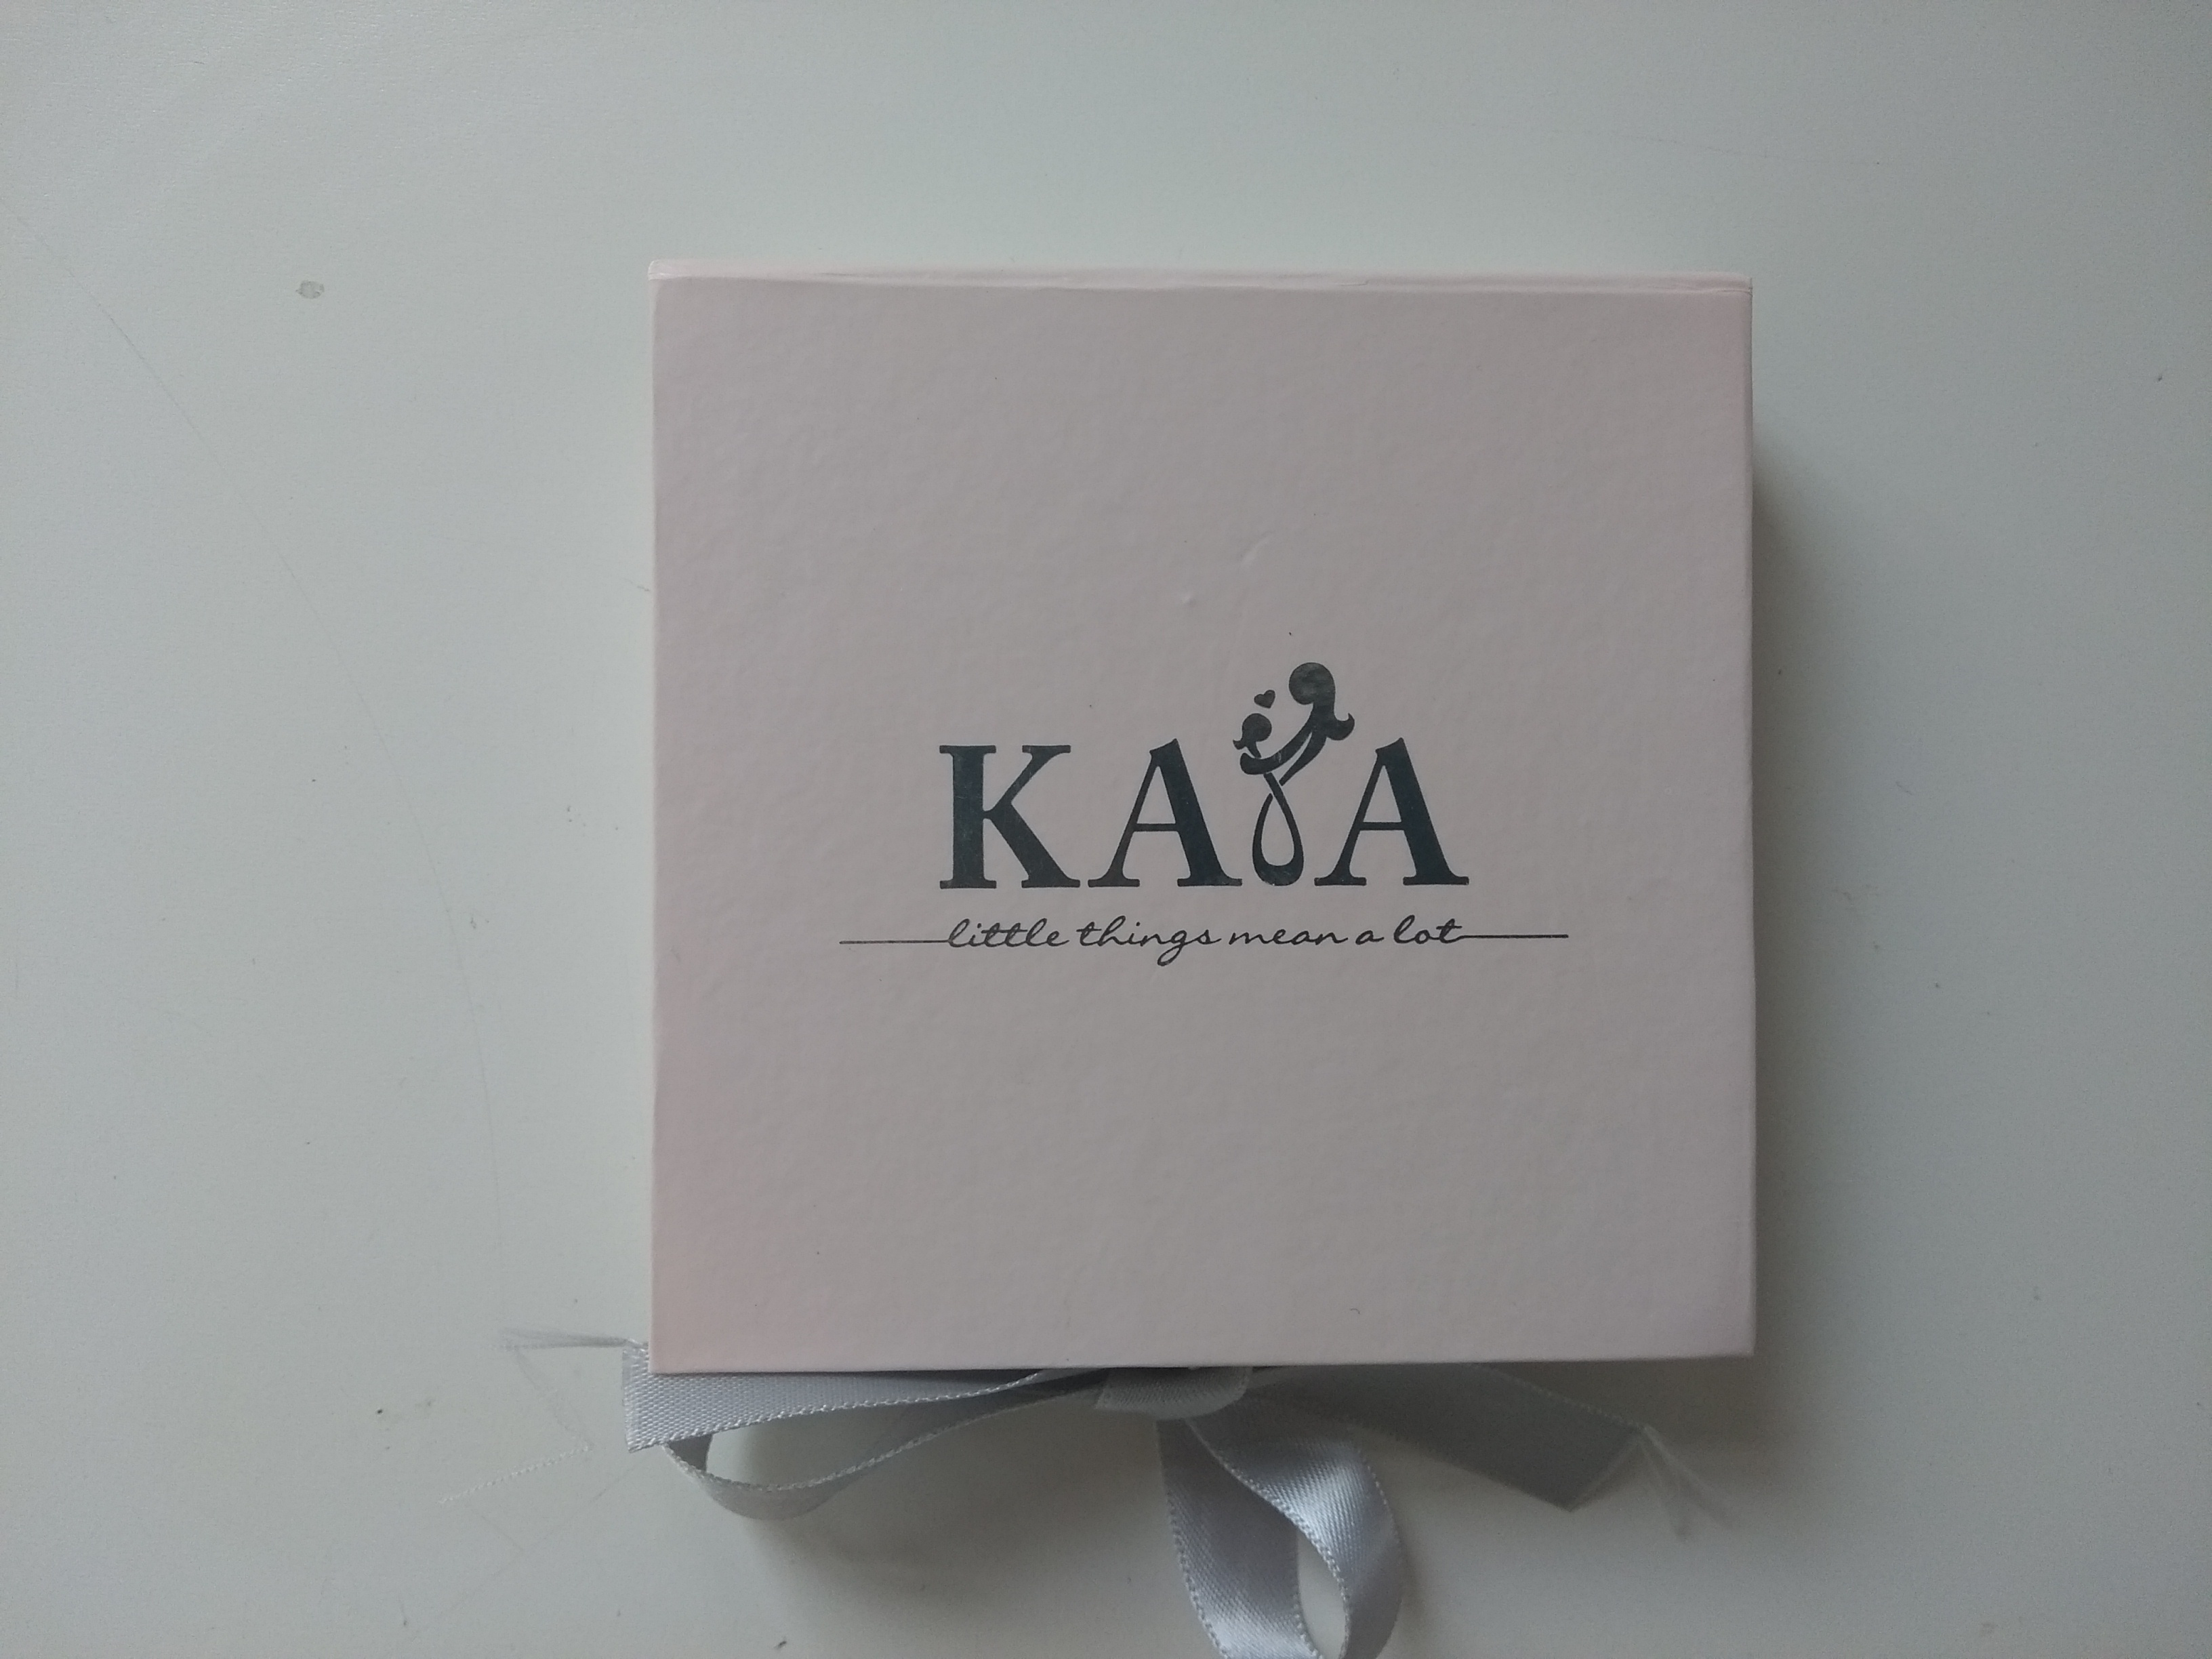 kayasieraden, kaya, armbandje, initialen, kayasieraden.nl, blog kaya sieraden, armbandje met voorletters, winactie, mamablog, lalogblog, lalog.nl